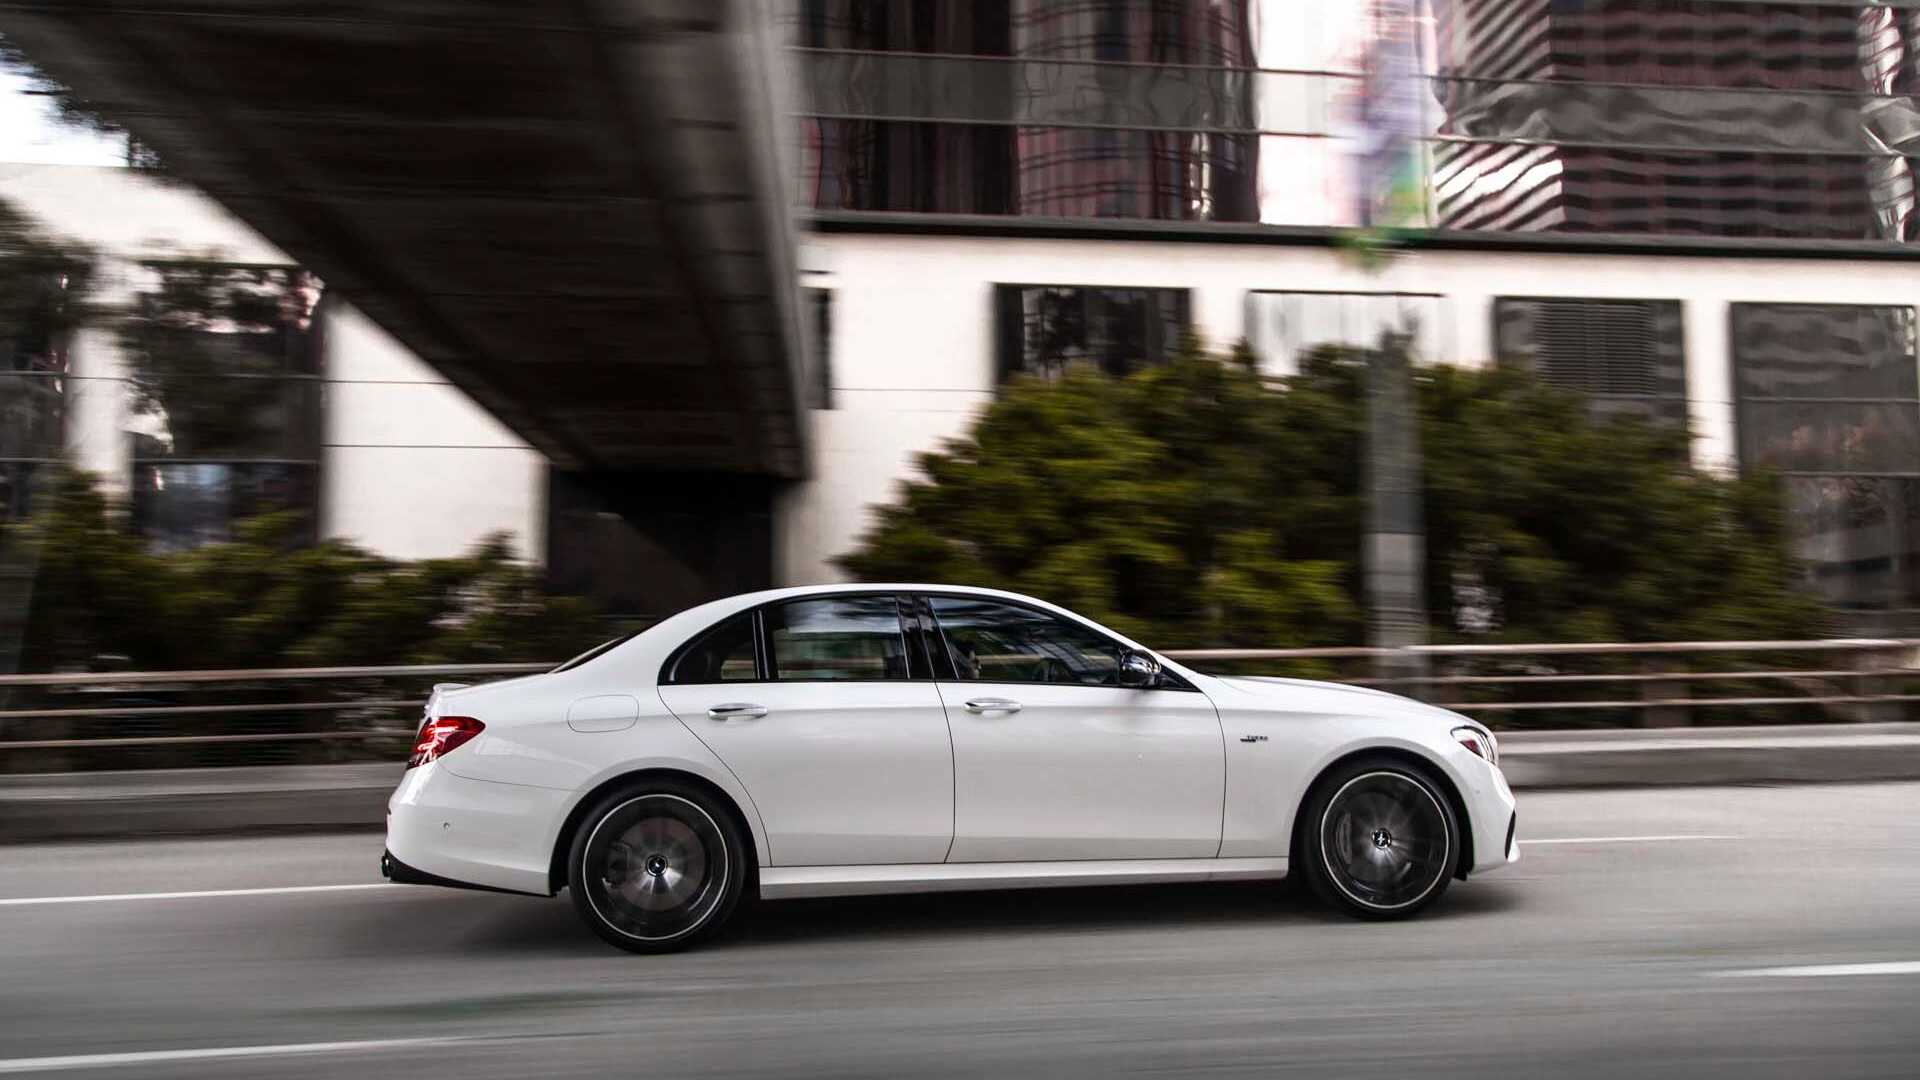 2019 Mercedes-Benz AMG E 53 sedan